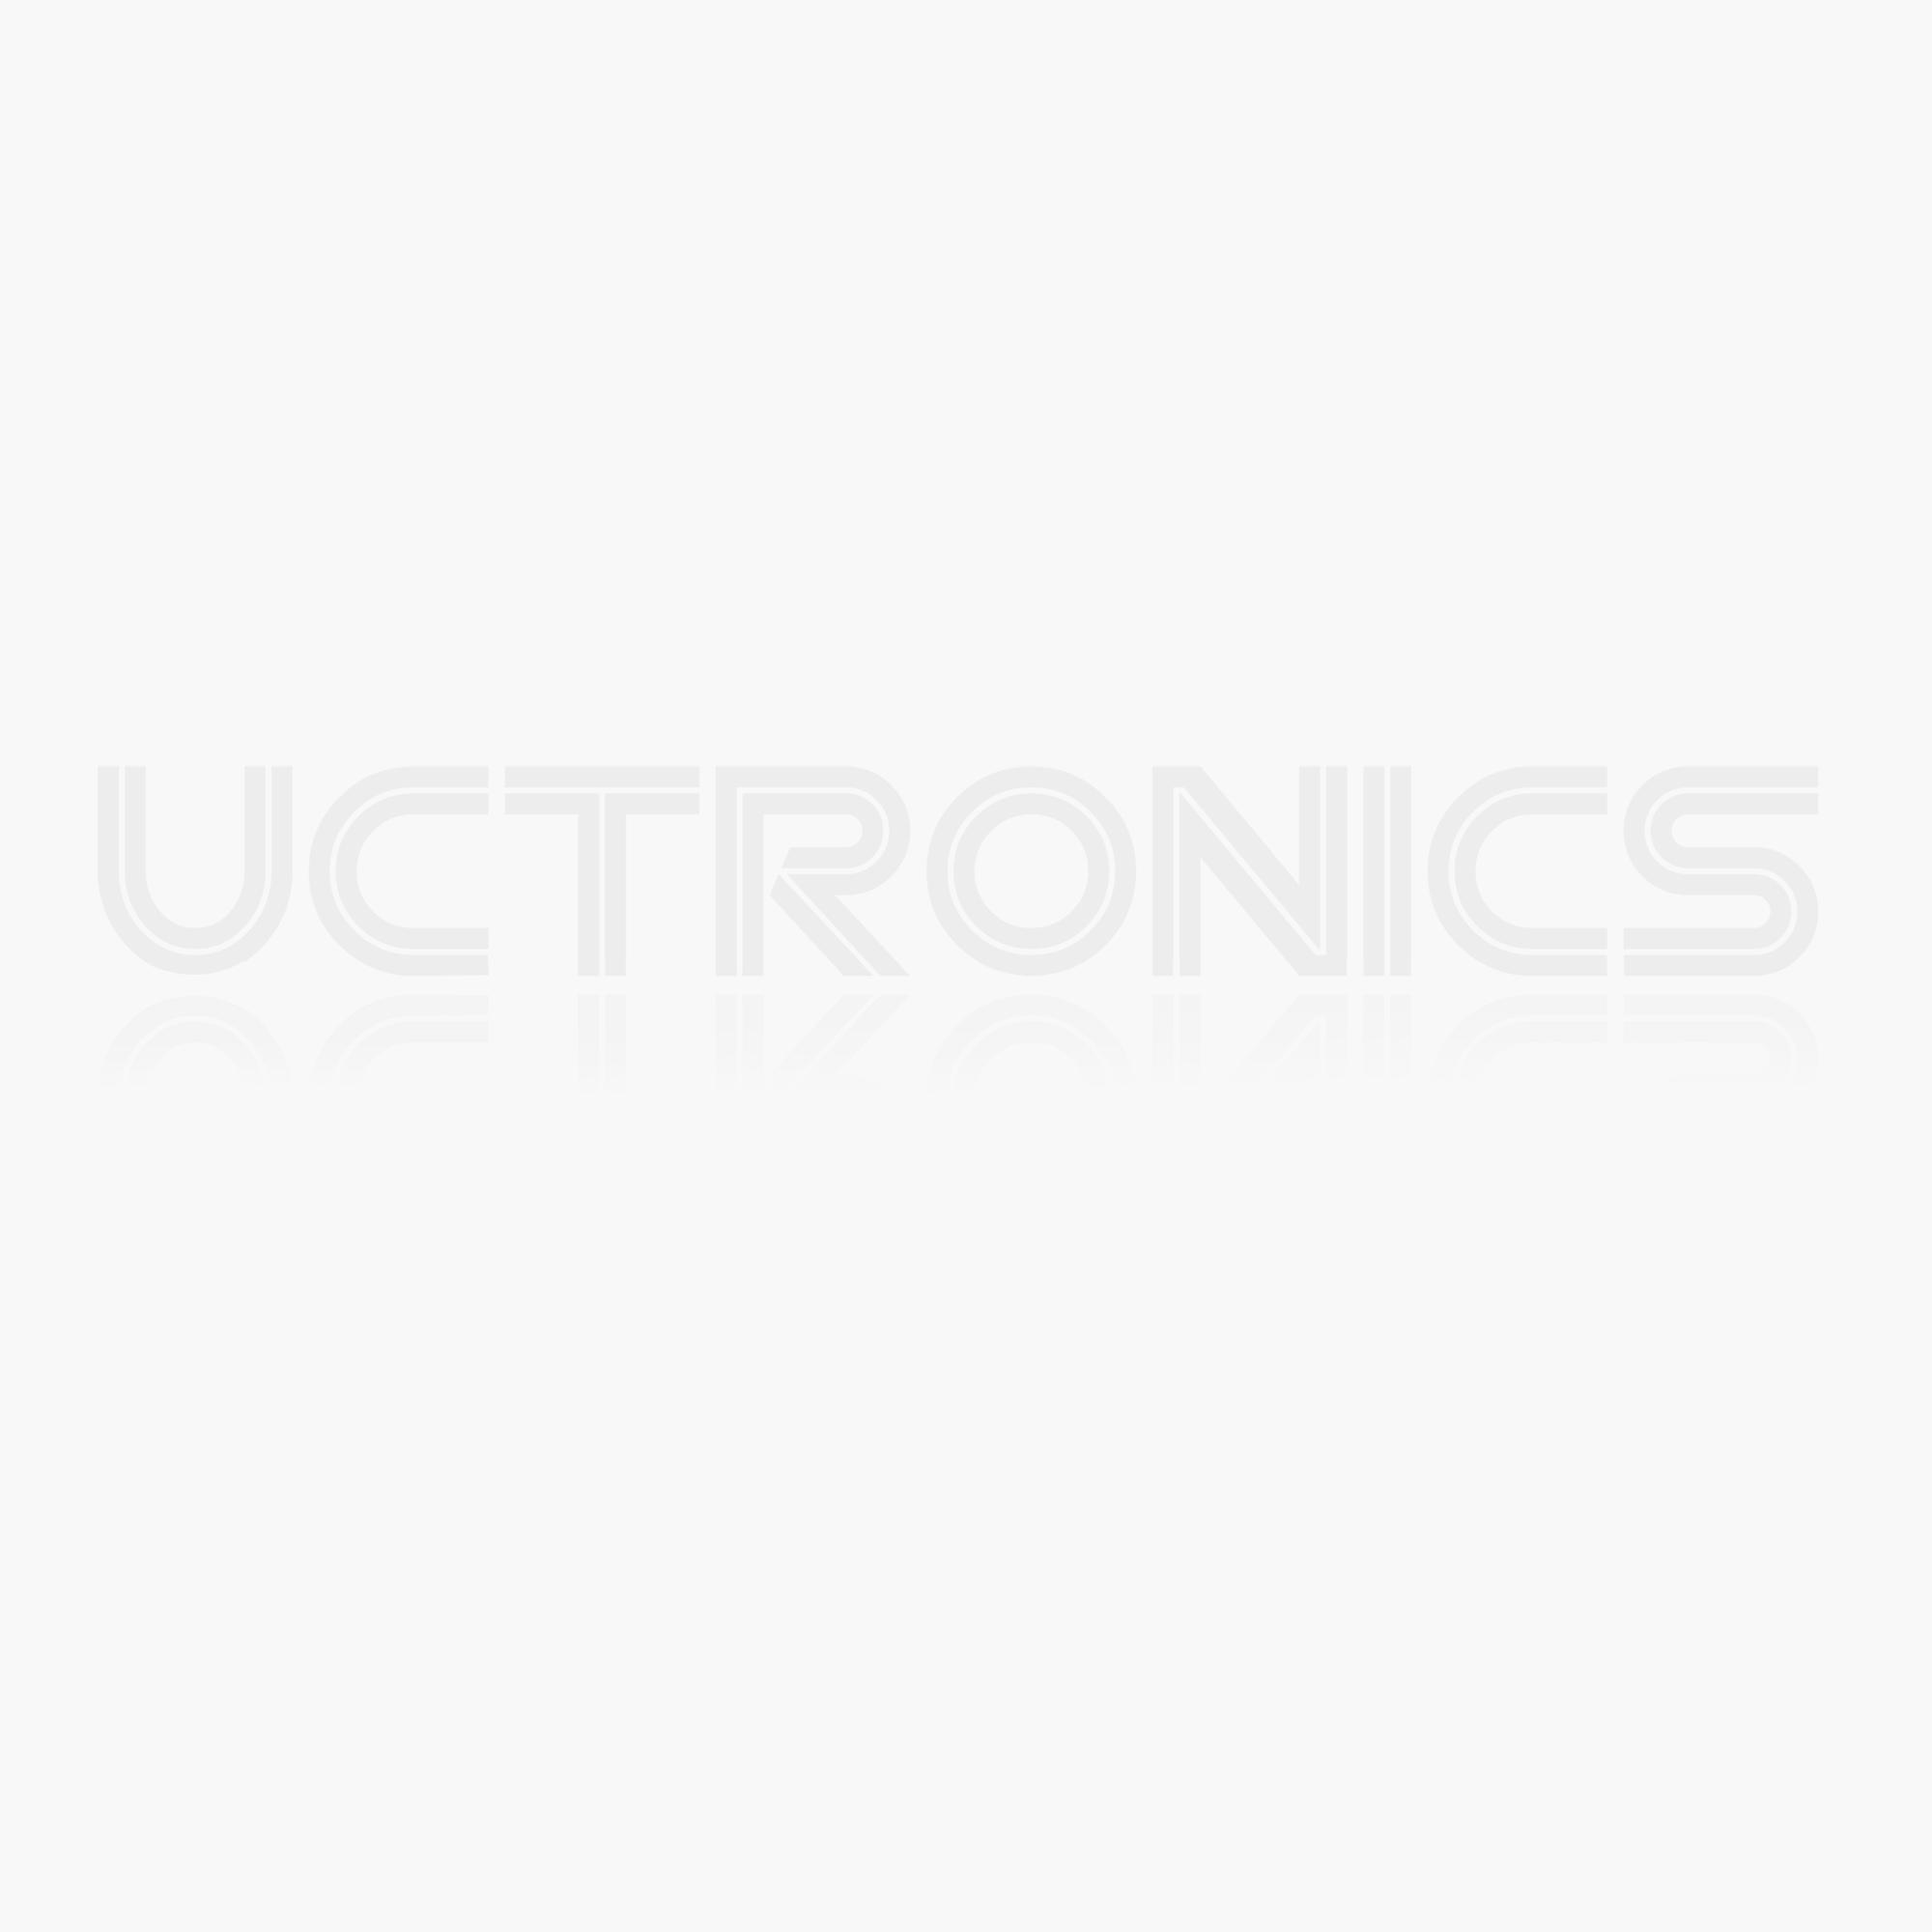 1Meter 10k 1% Waterproof NTC Thermistor Temperature Sensor Probe #2